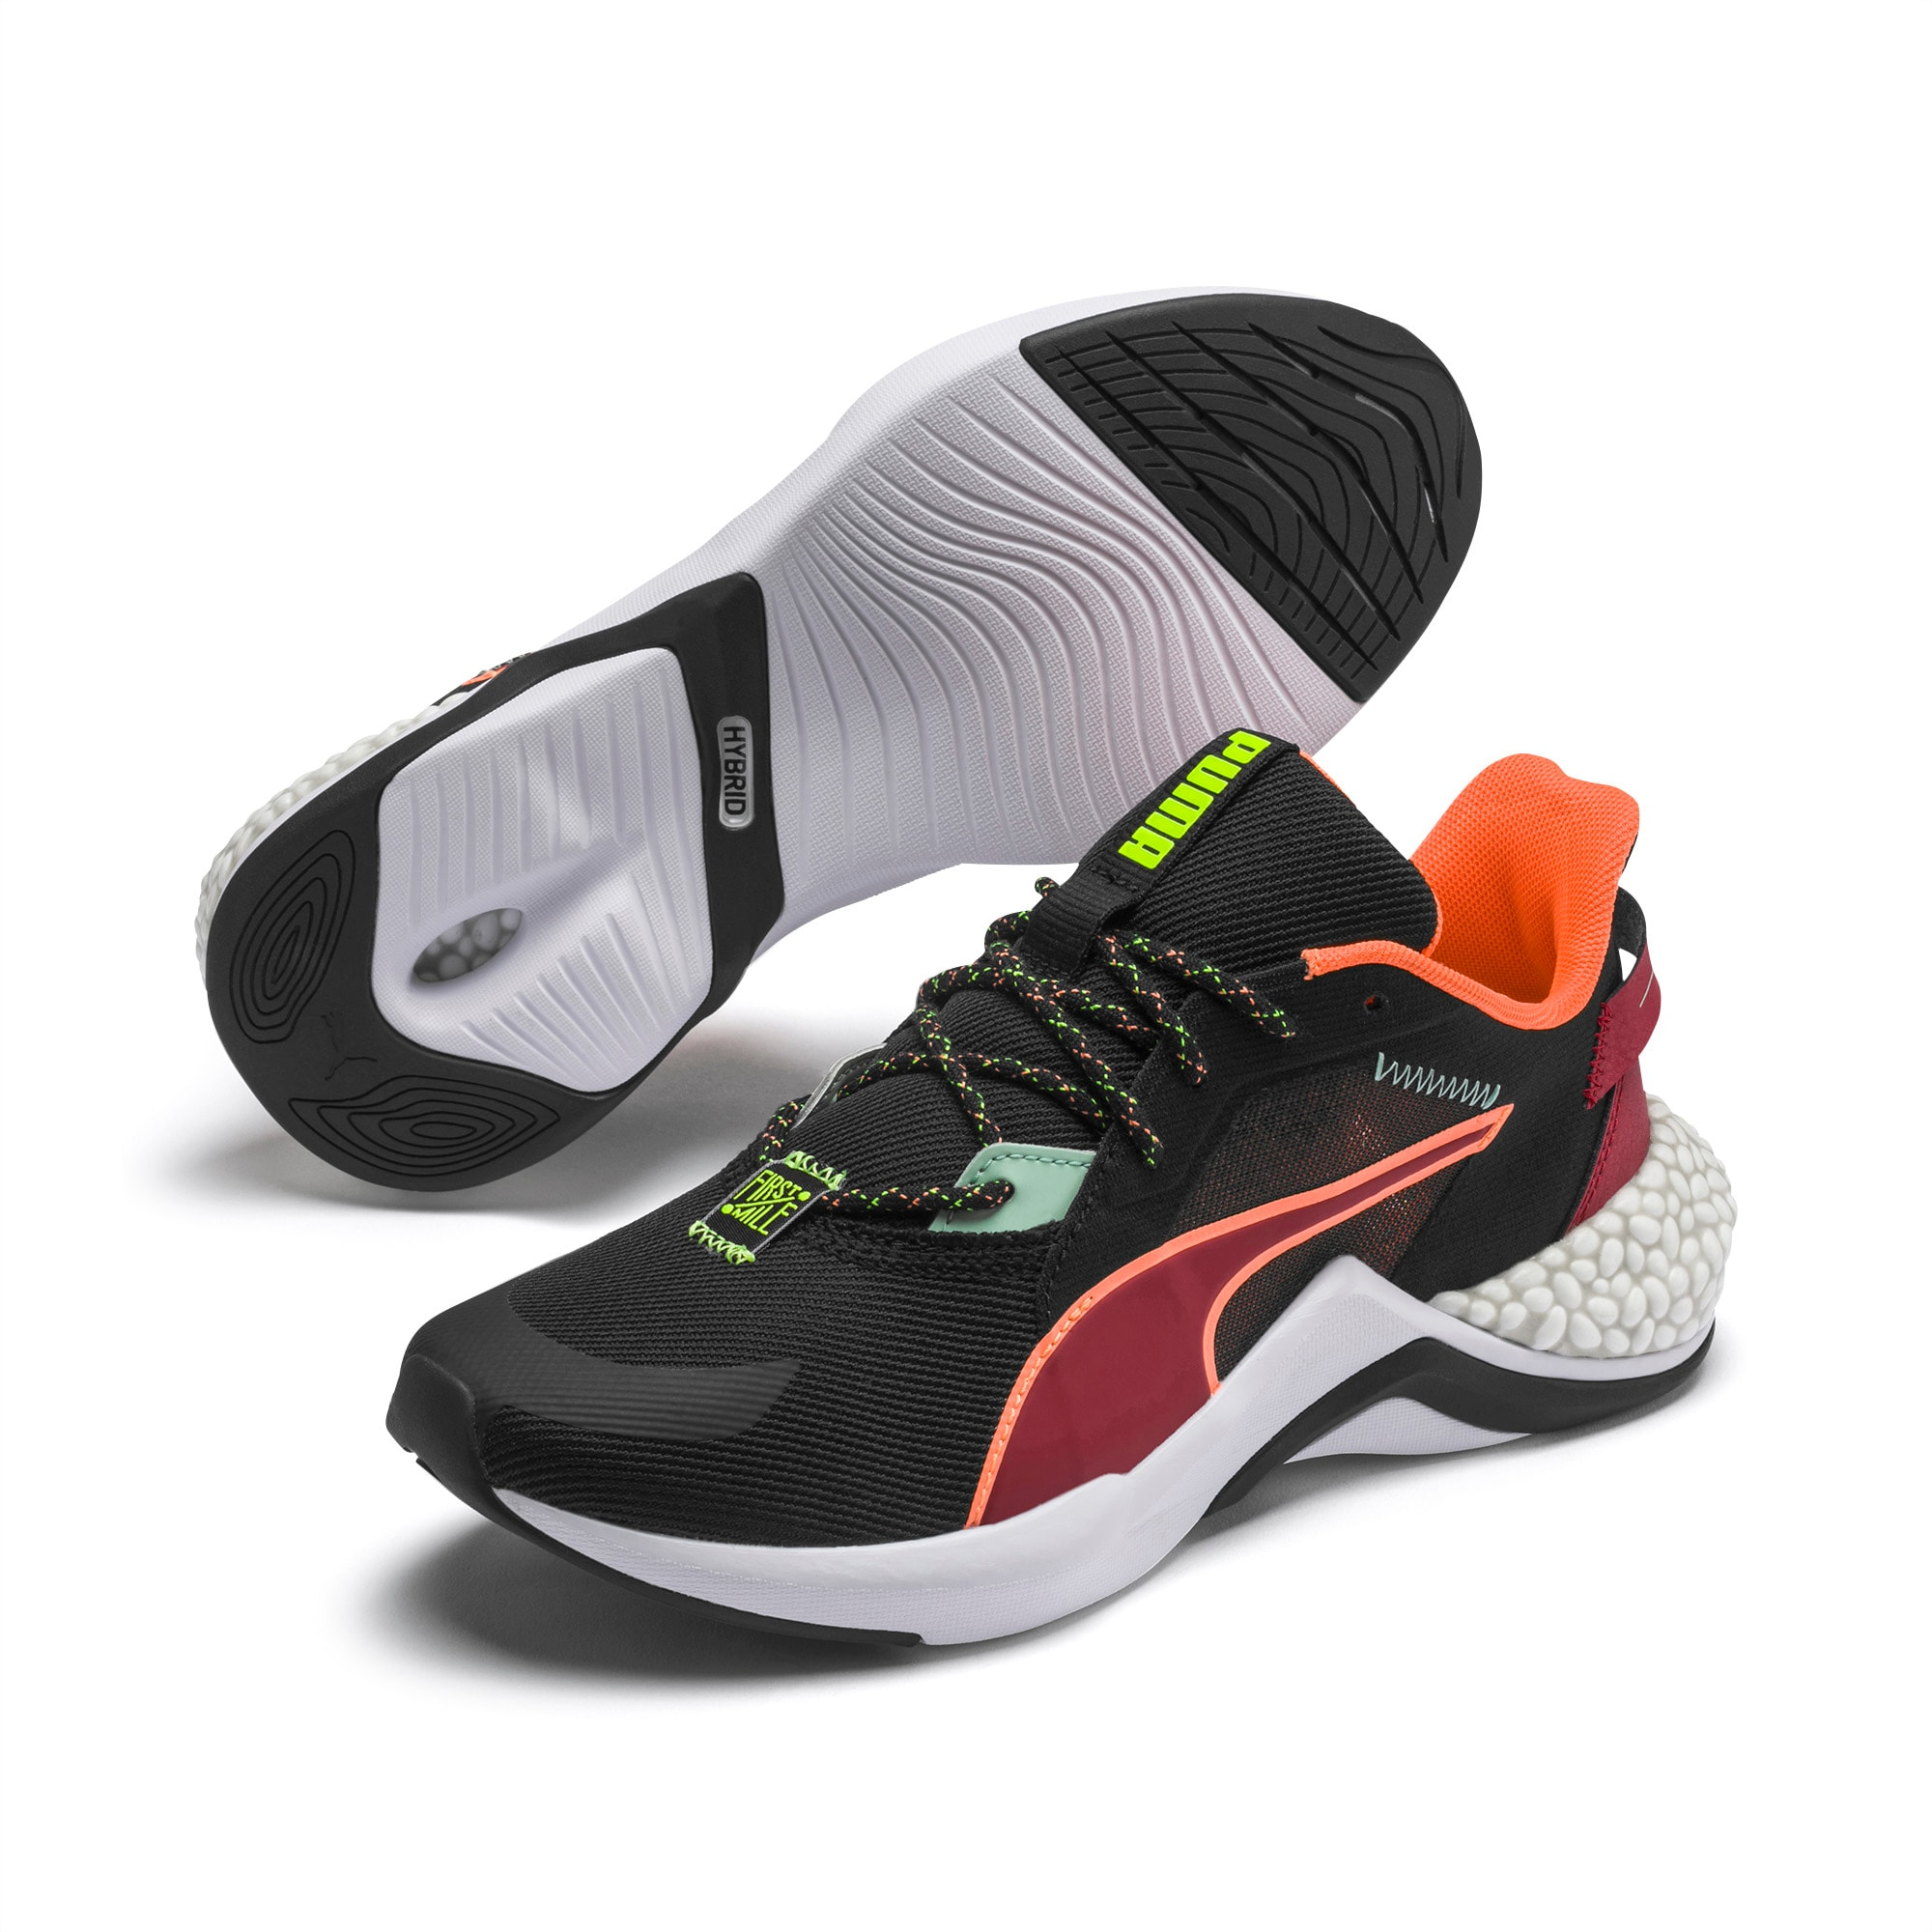 PUMA x FIRST MILE HYBRID NX Ozone Women's Running Shoes